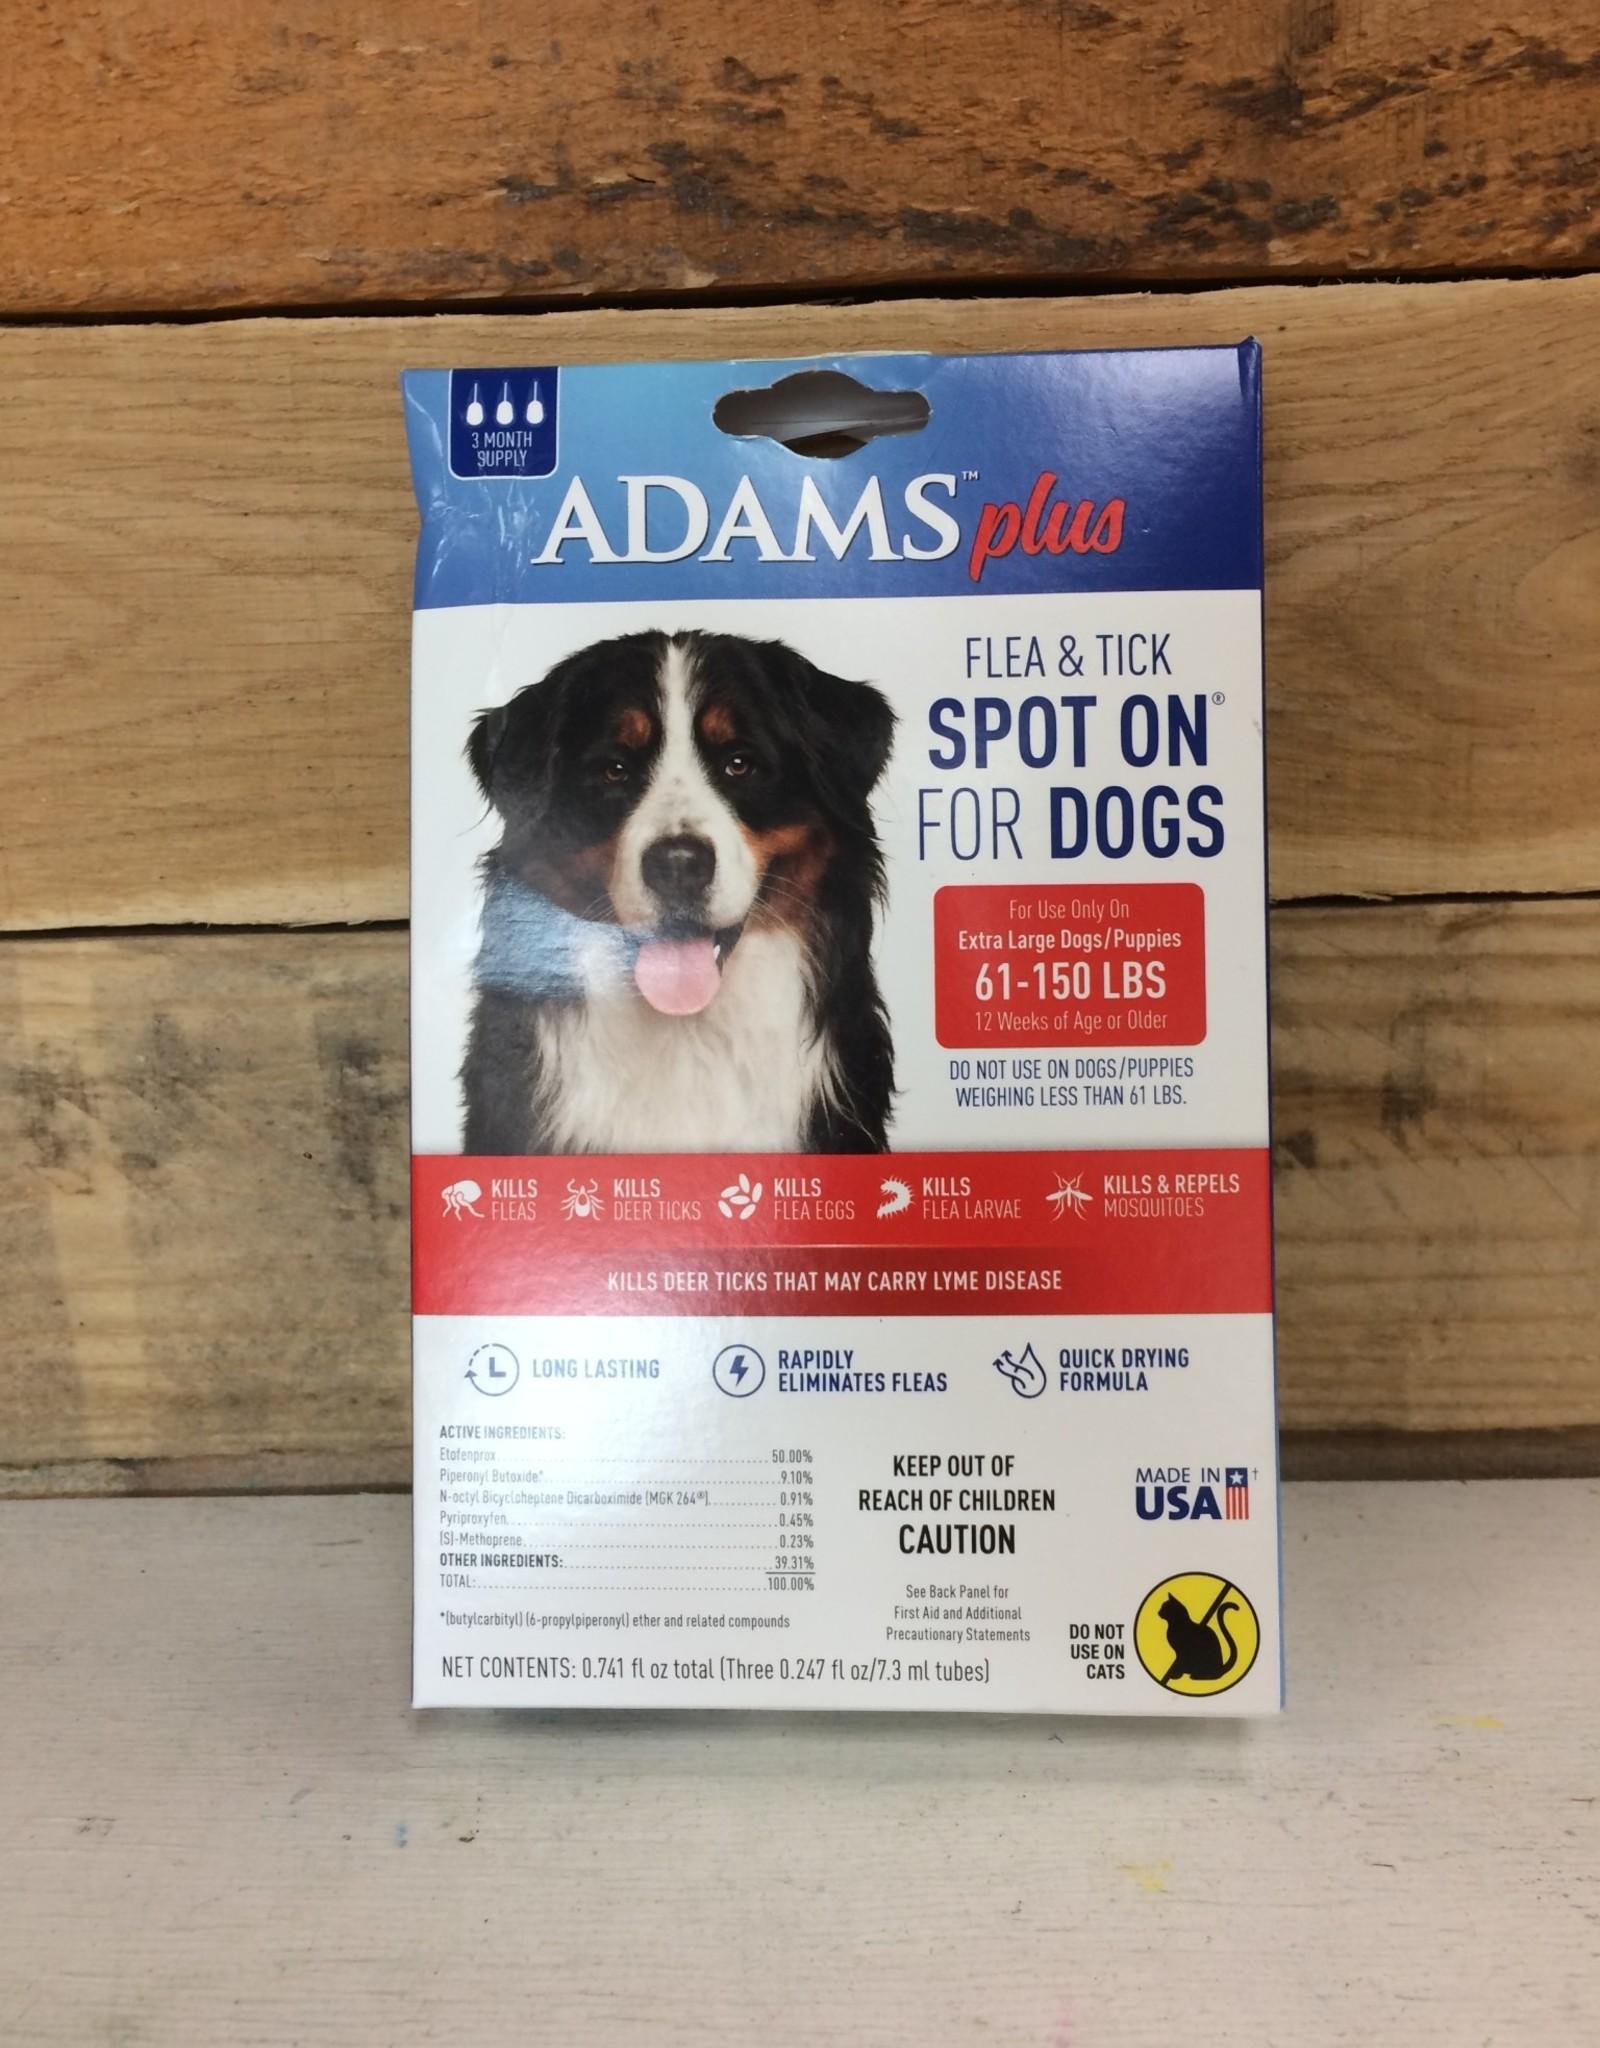 Central Life Sciences- Adams Adams Plus Flea & Tick Spot On Dog XL 3 Month